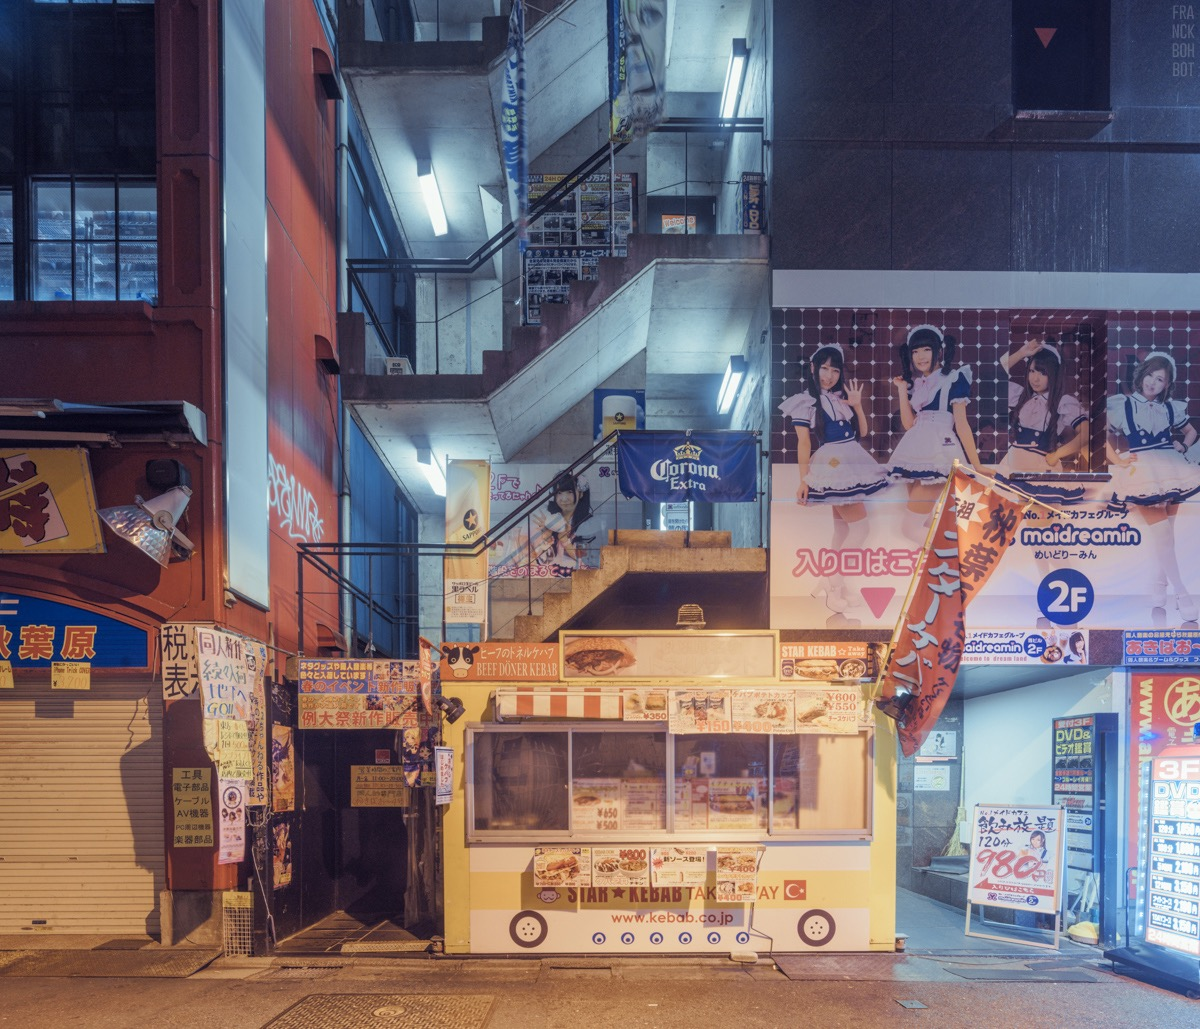 Franck_Bohbot-Tokyo_Murmurings-Photogrvphy_Magazine_05